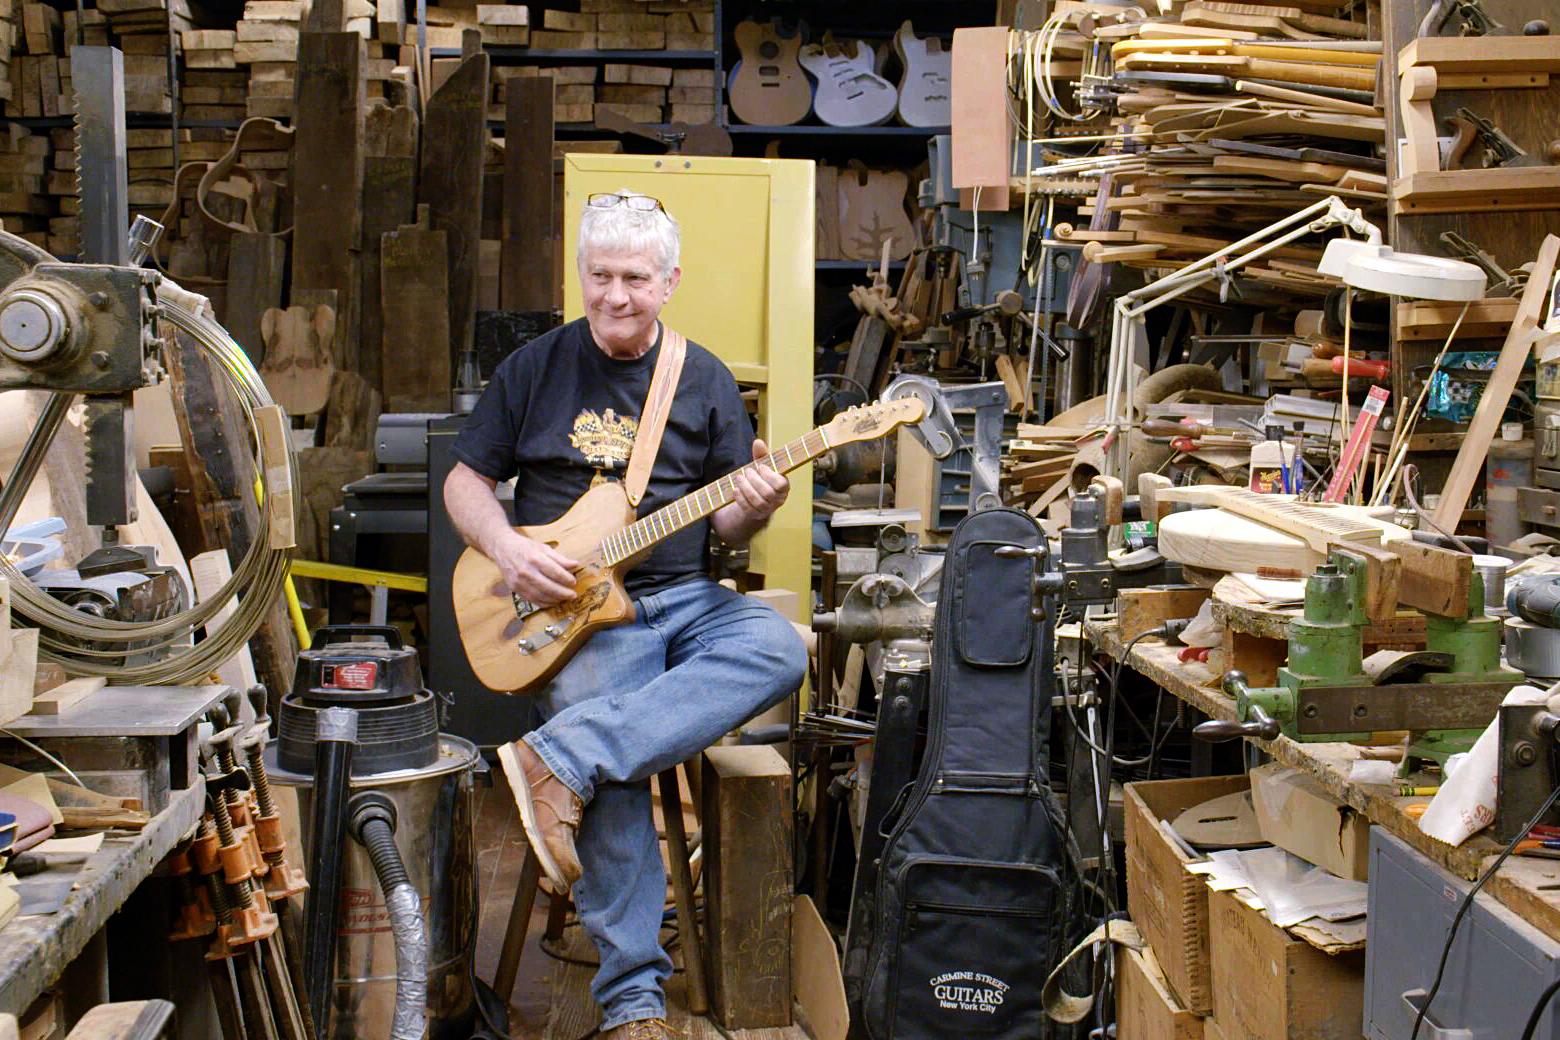 'Carmine Street Guitars' Review: Ballad of an Unsung NYC Musical Hero